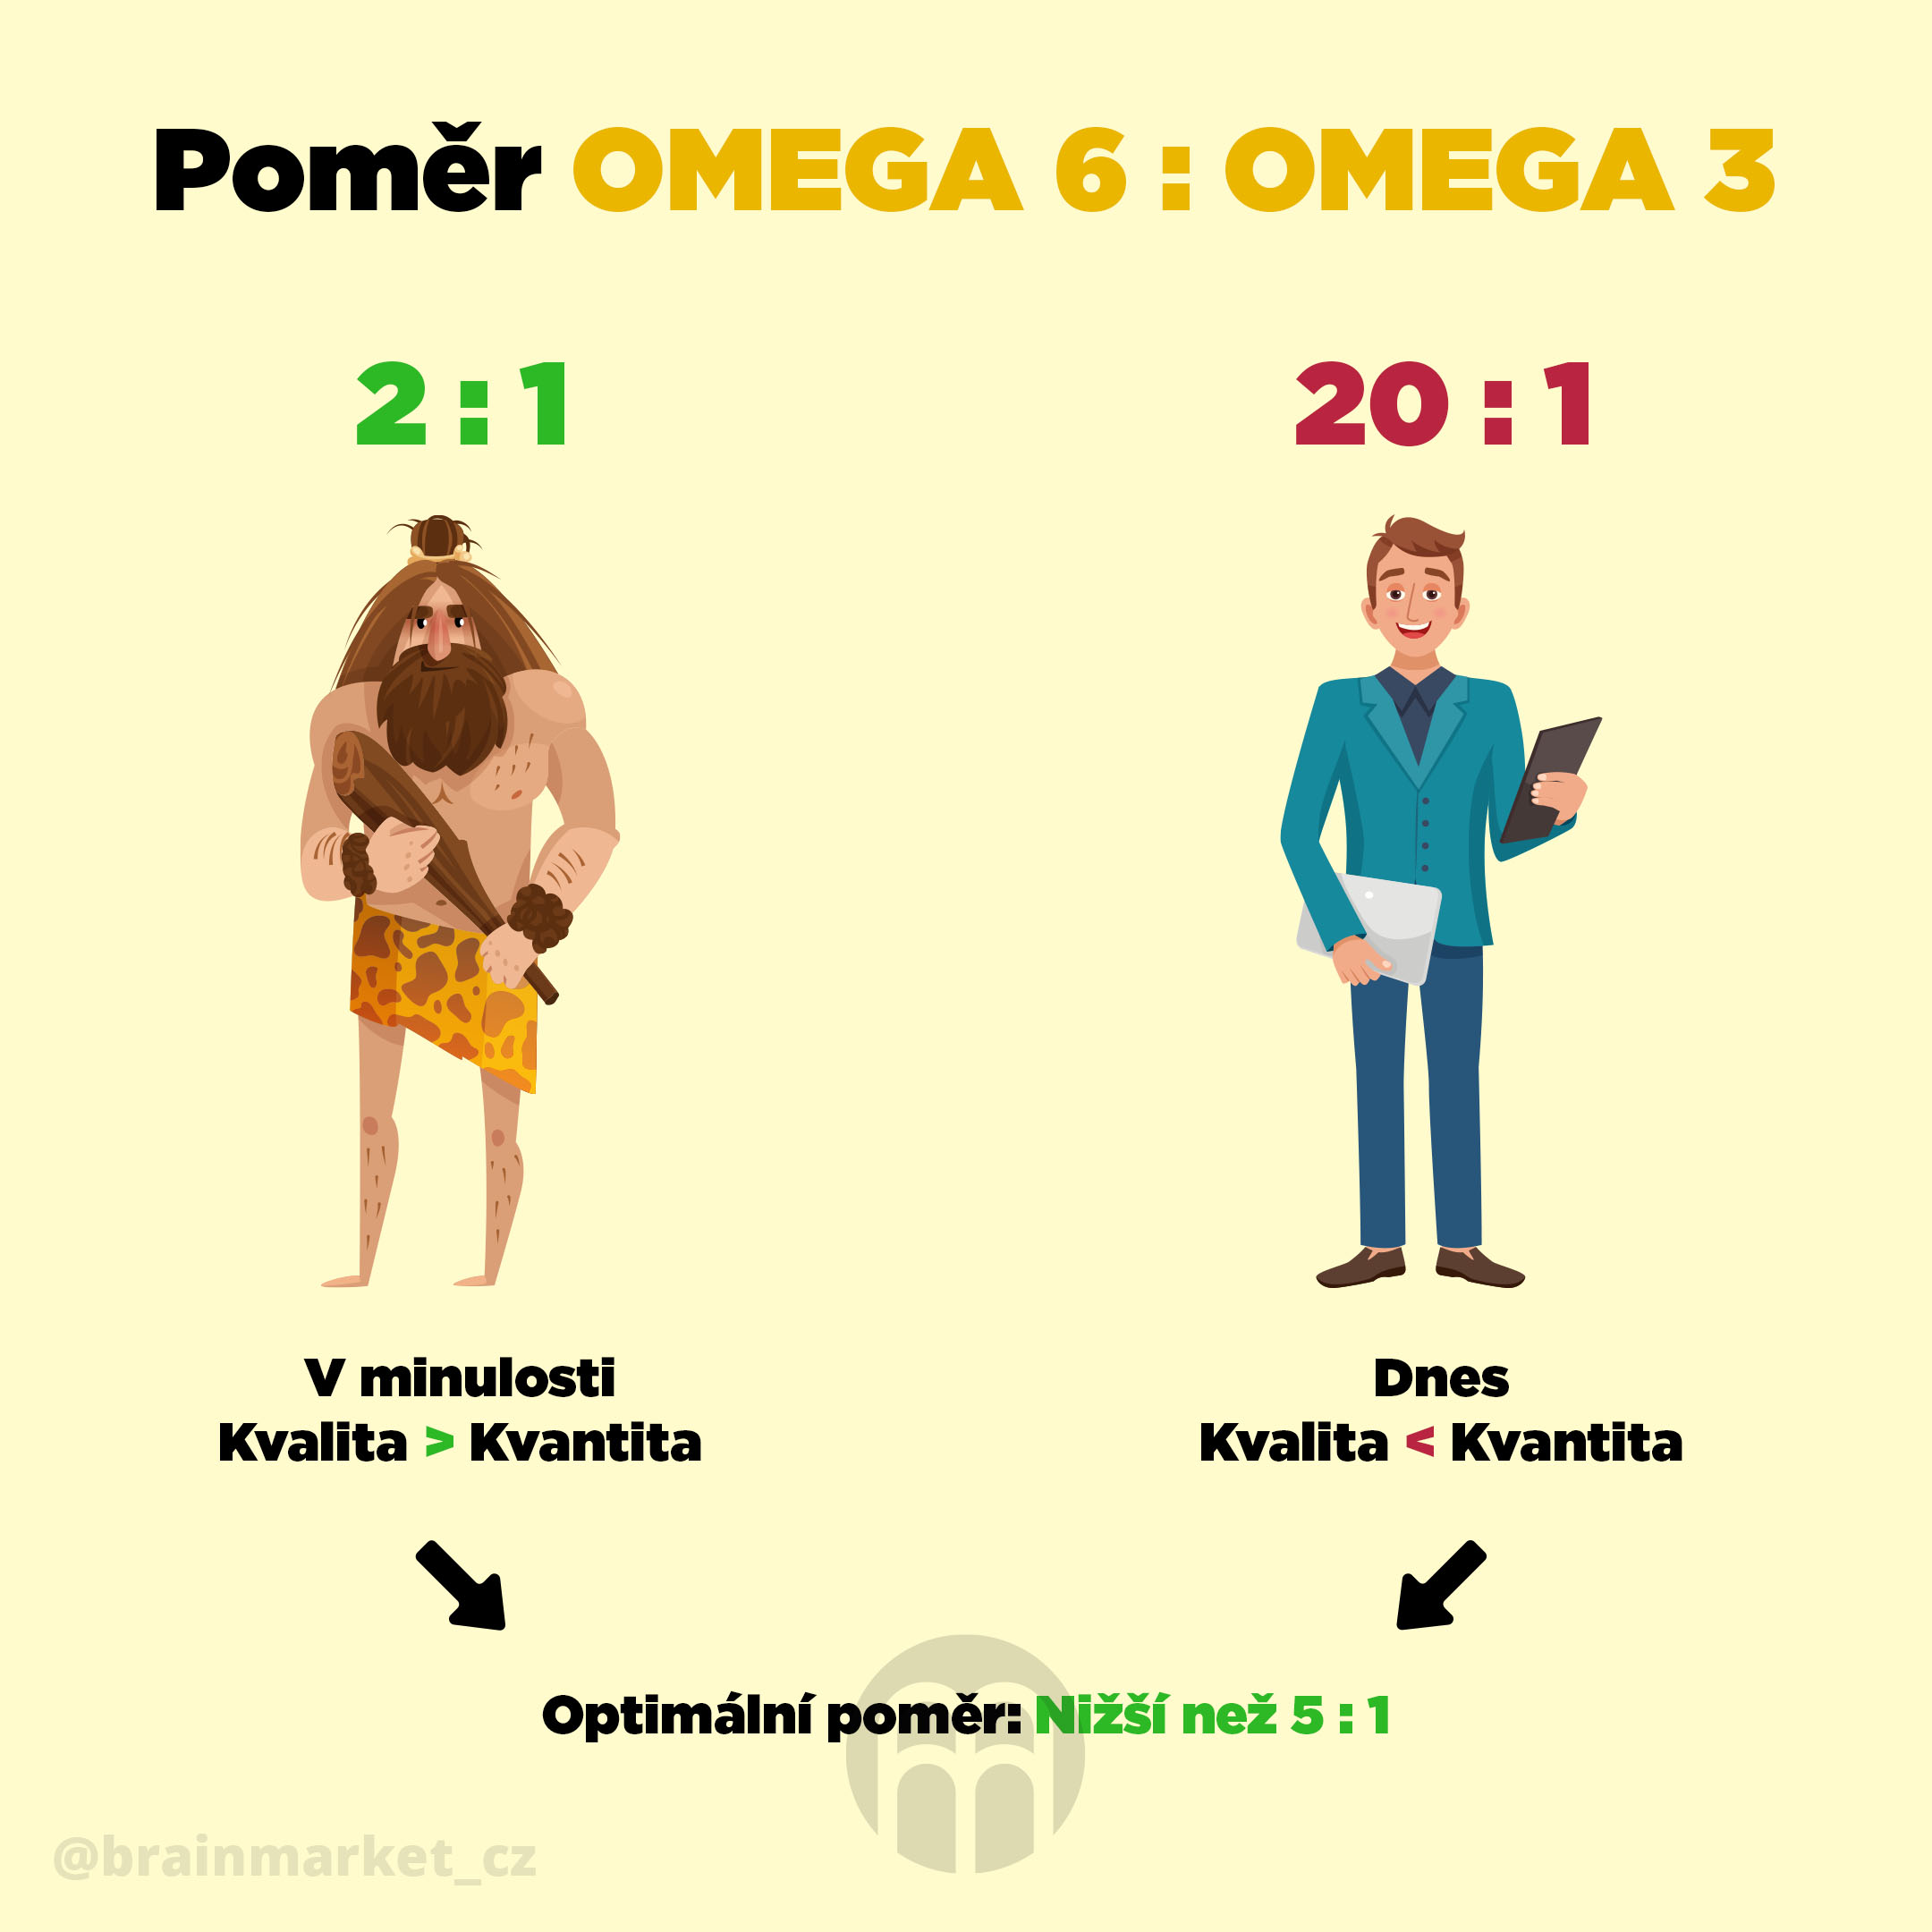 optimalni-pomer-omega-3-a-omega-6-infografika-brainmarket-cz